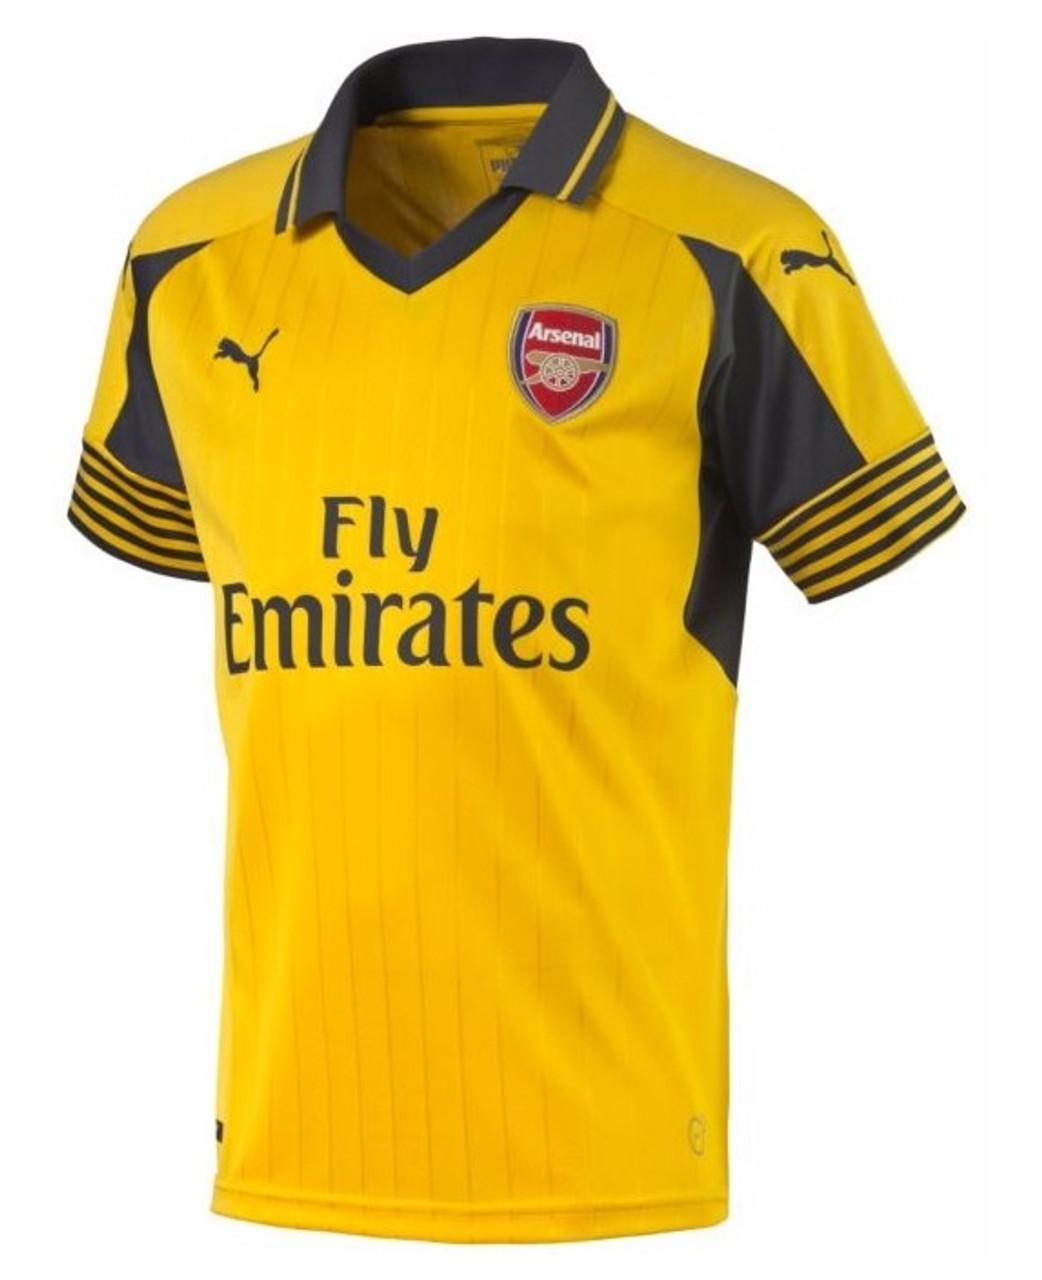 Puma Arsenal 2016-2017 Away Jersey Spectra - Yellow Ebony (101117 ... 00b4768fb